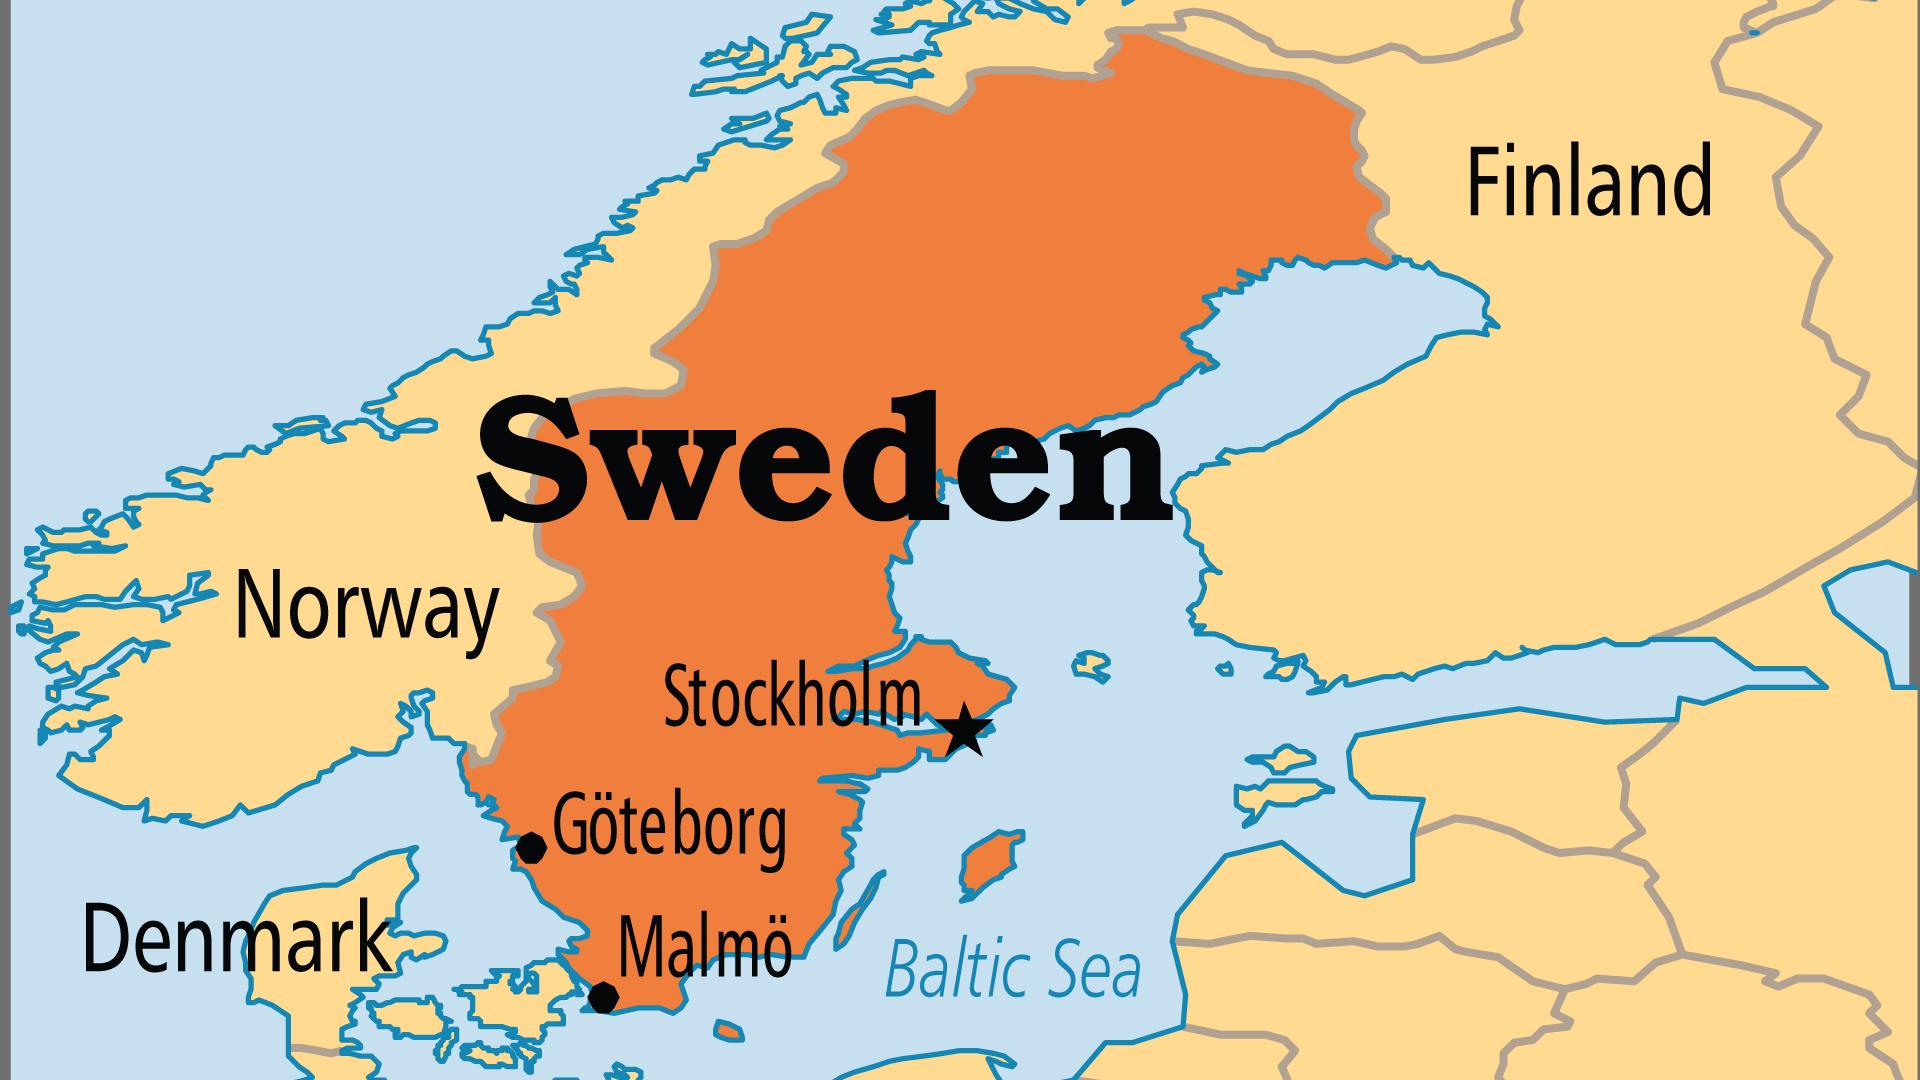 swed-02